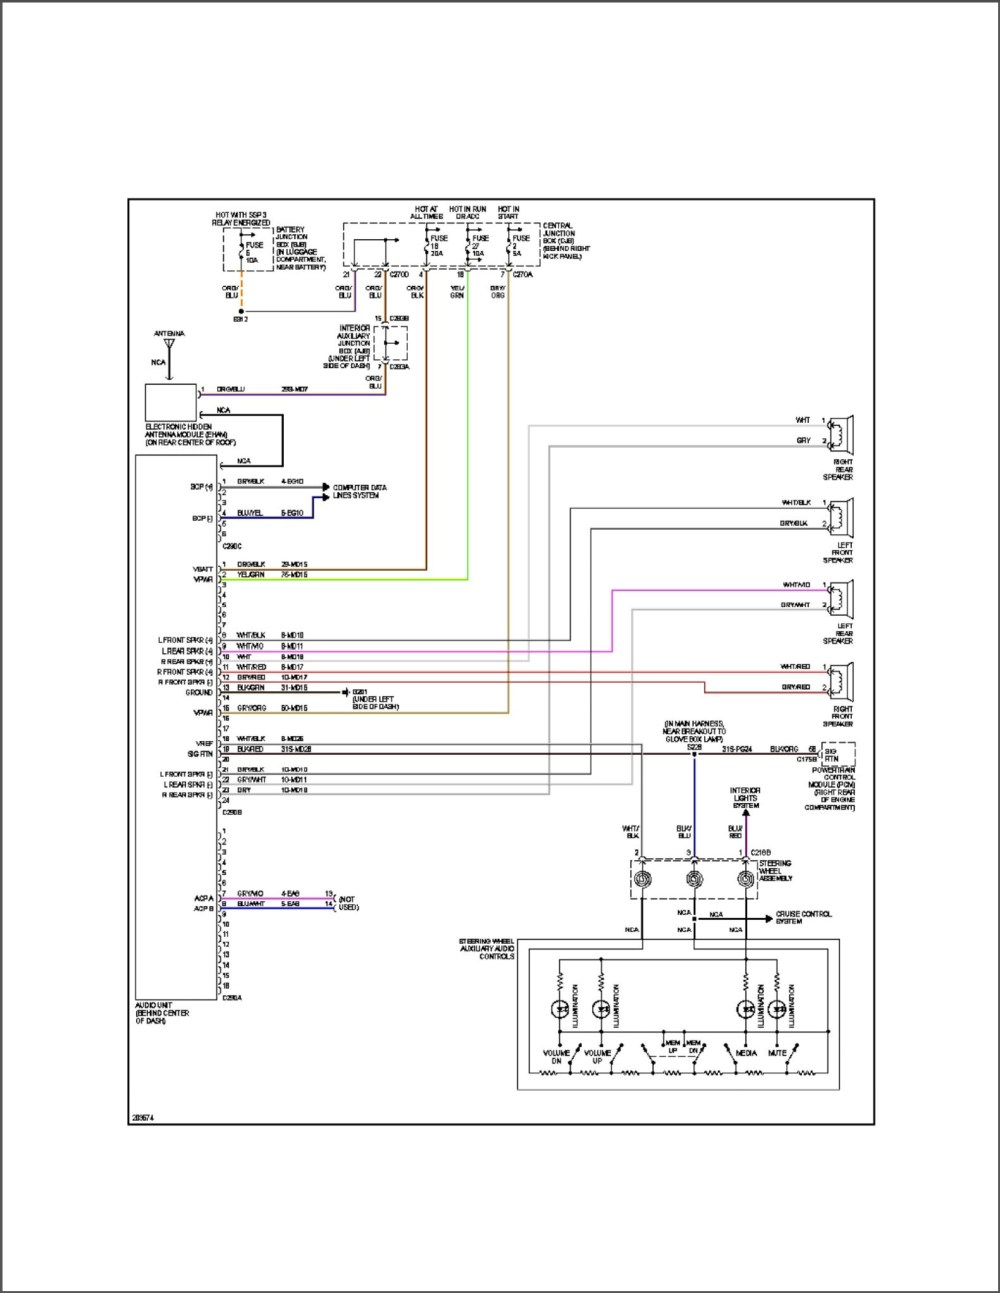 medium resolution of 2000 lincoln ls engine diagram fresh 2000 lincoln town car wiring diagram irelandnews of 2000 lincoln